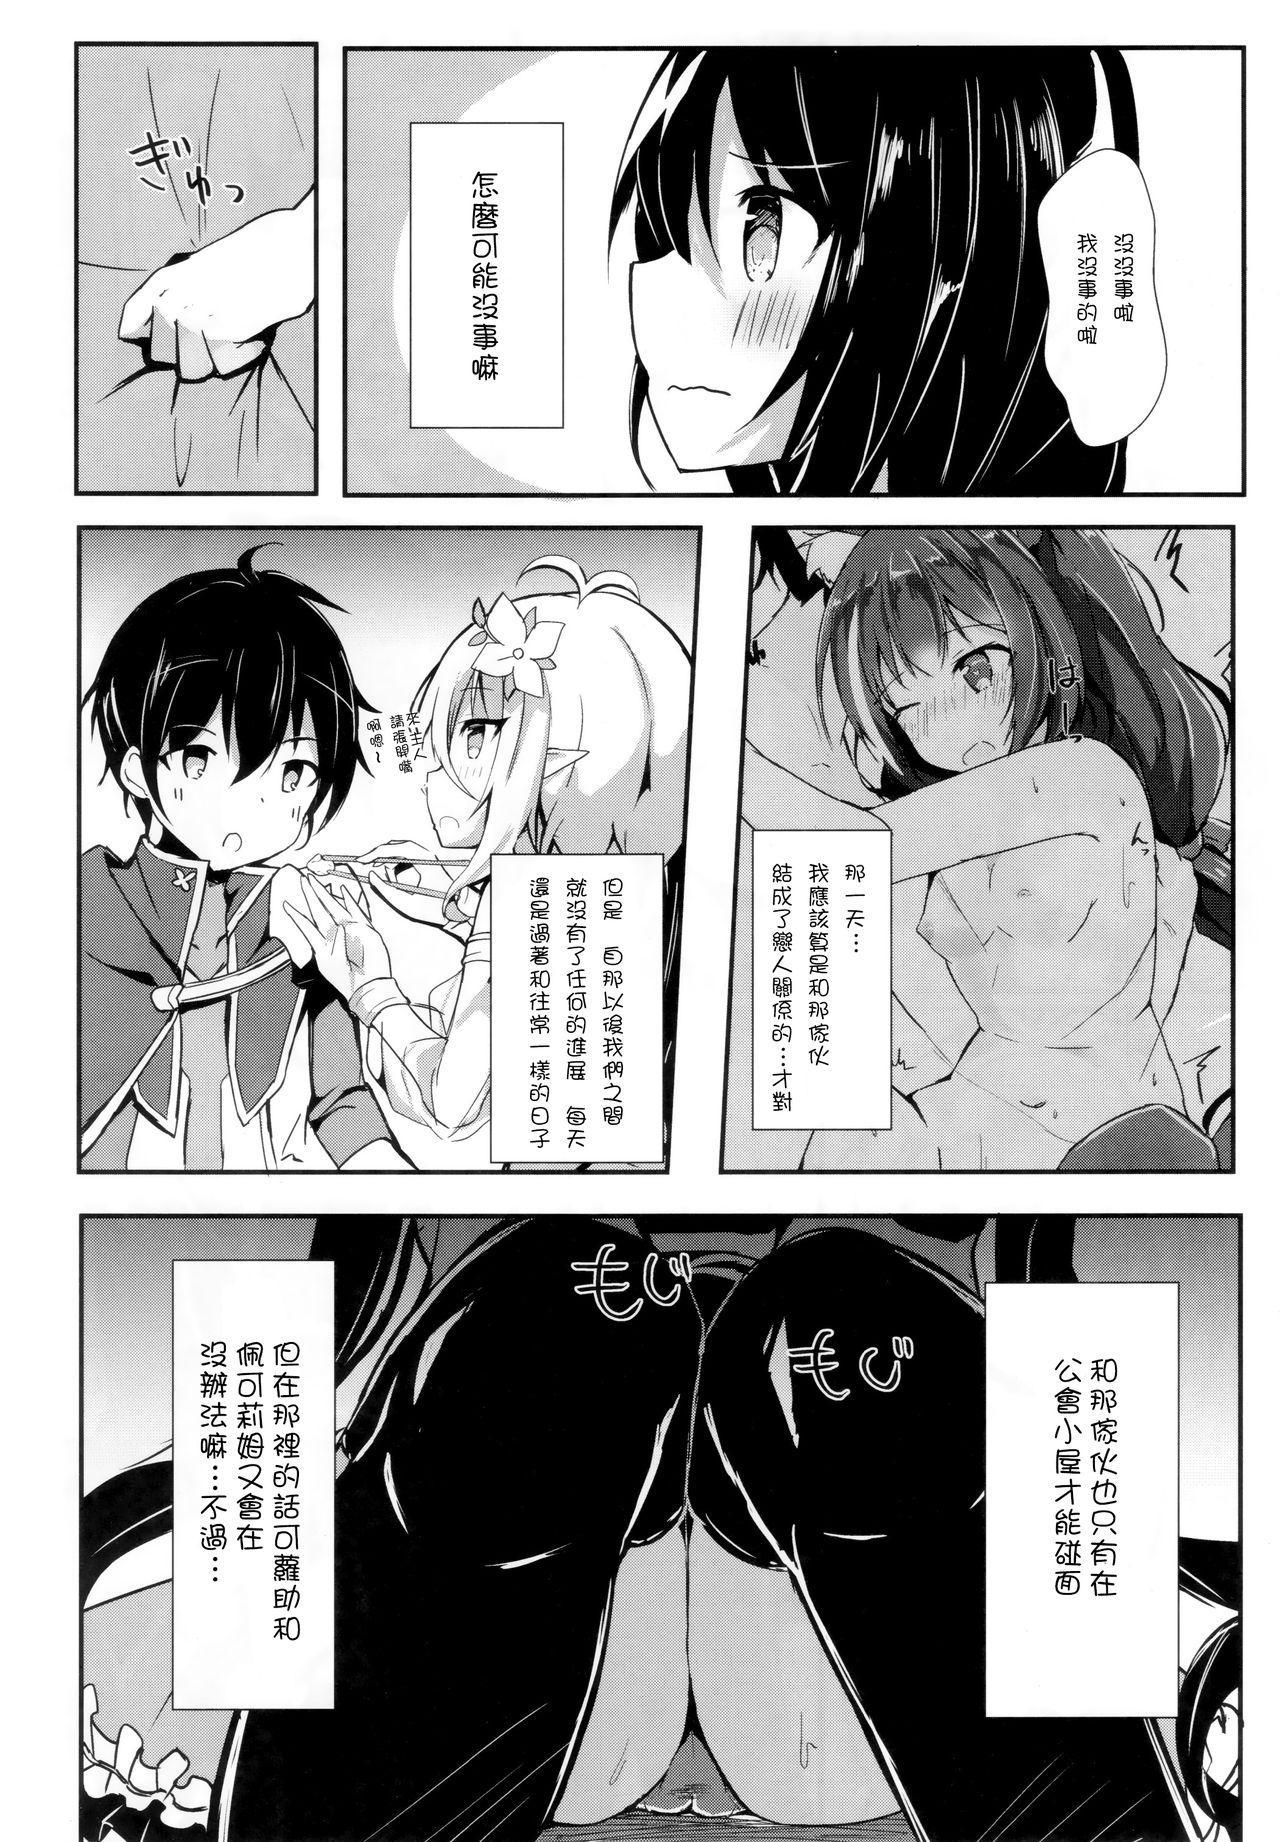 Deredere Kyaru-chan to Ichaicha Ecchi 2 2